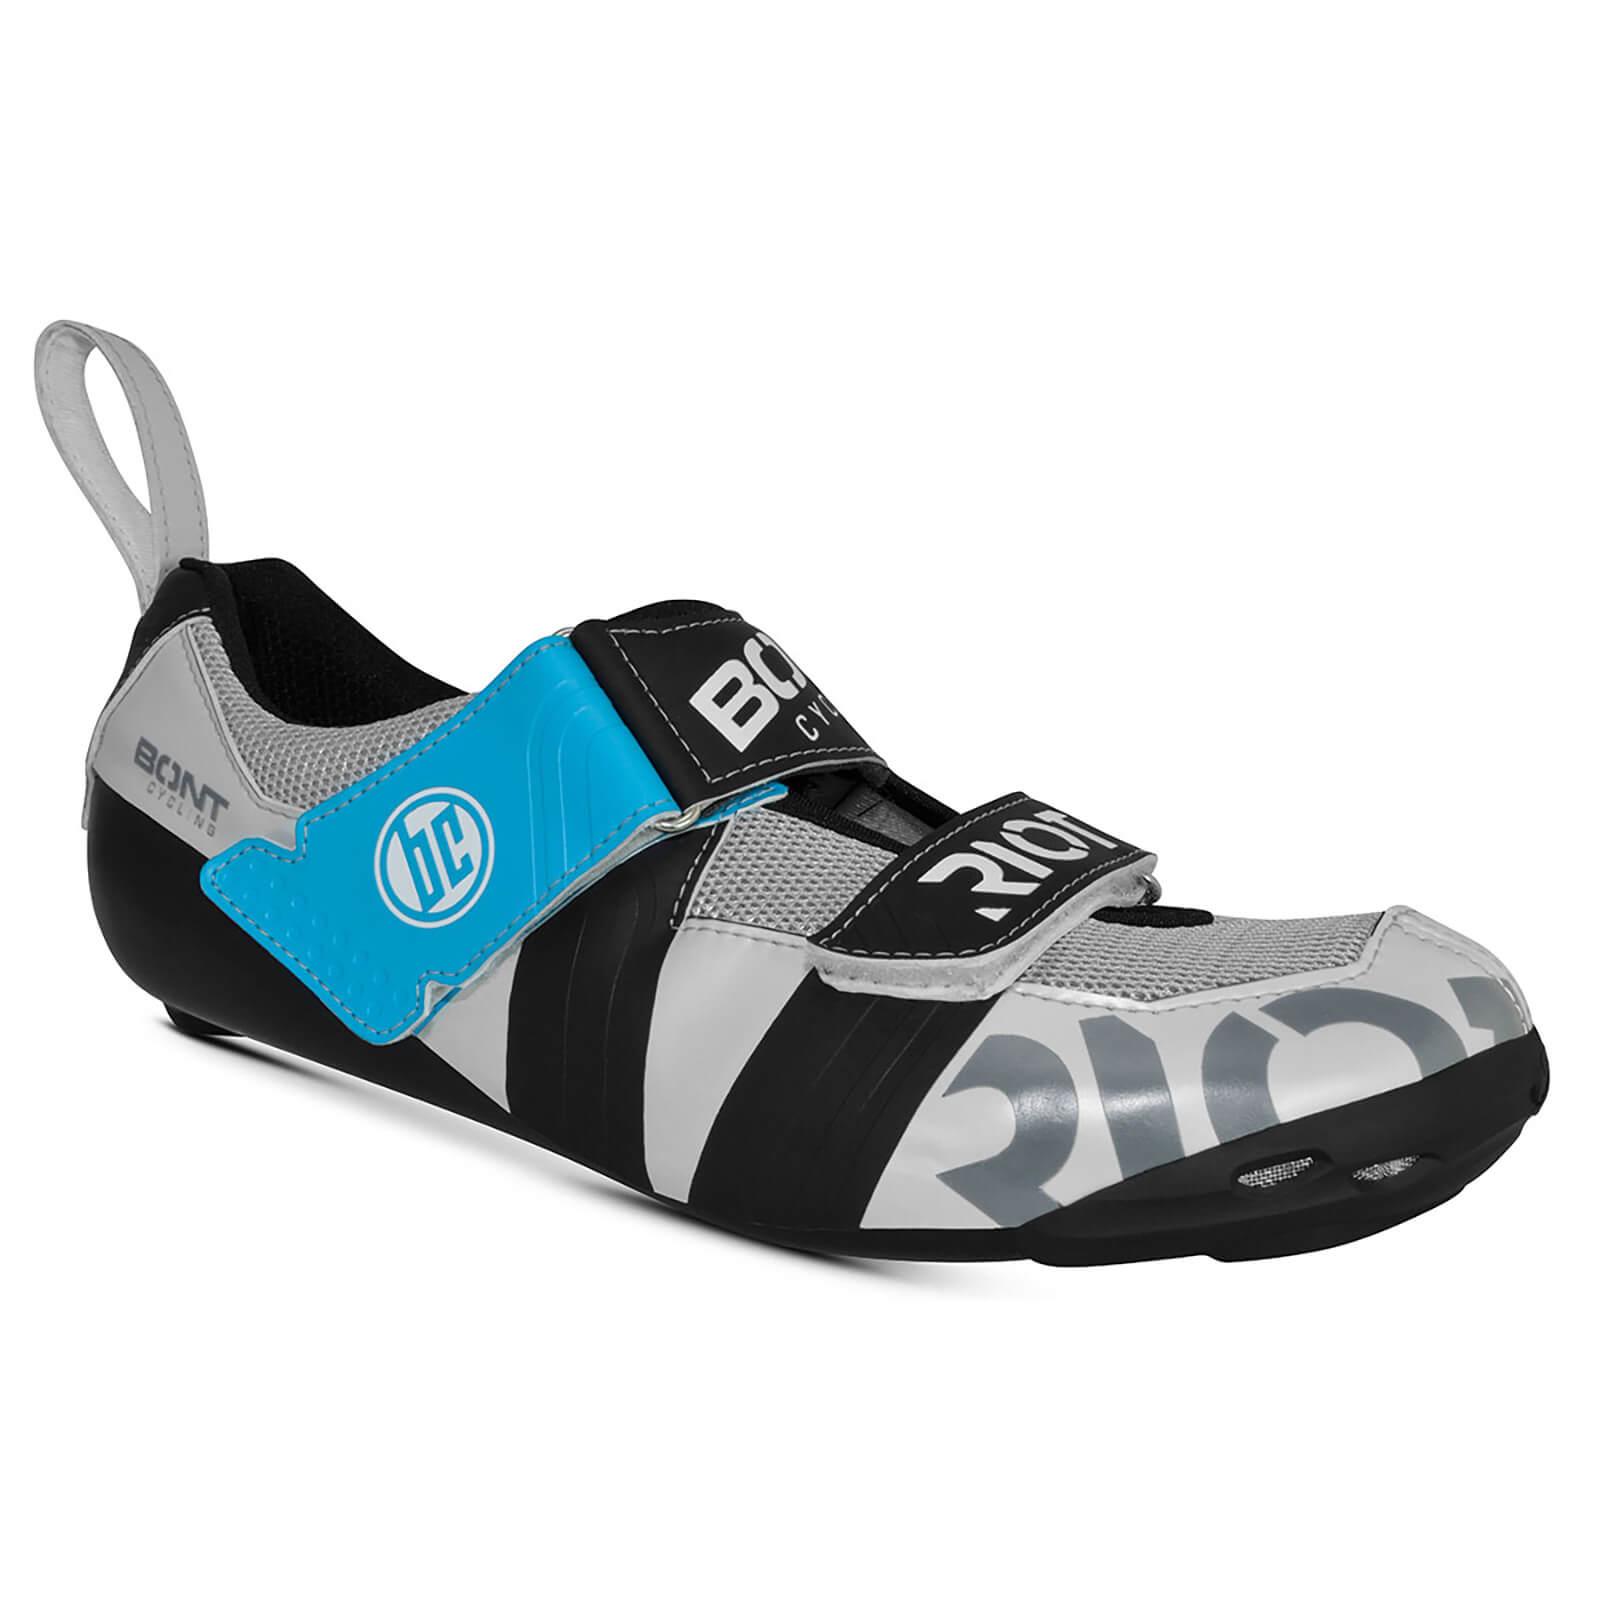 Bont Riot TR+ Road Shoes - EU 46.5 - White/Black